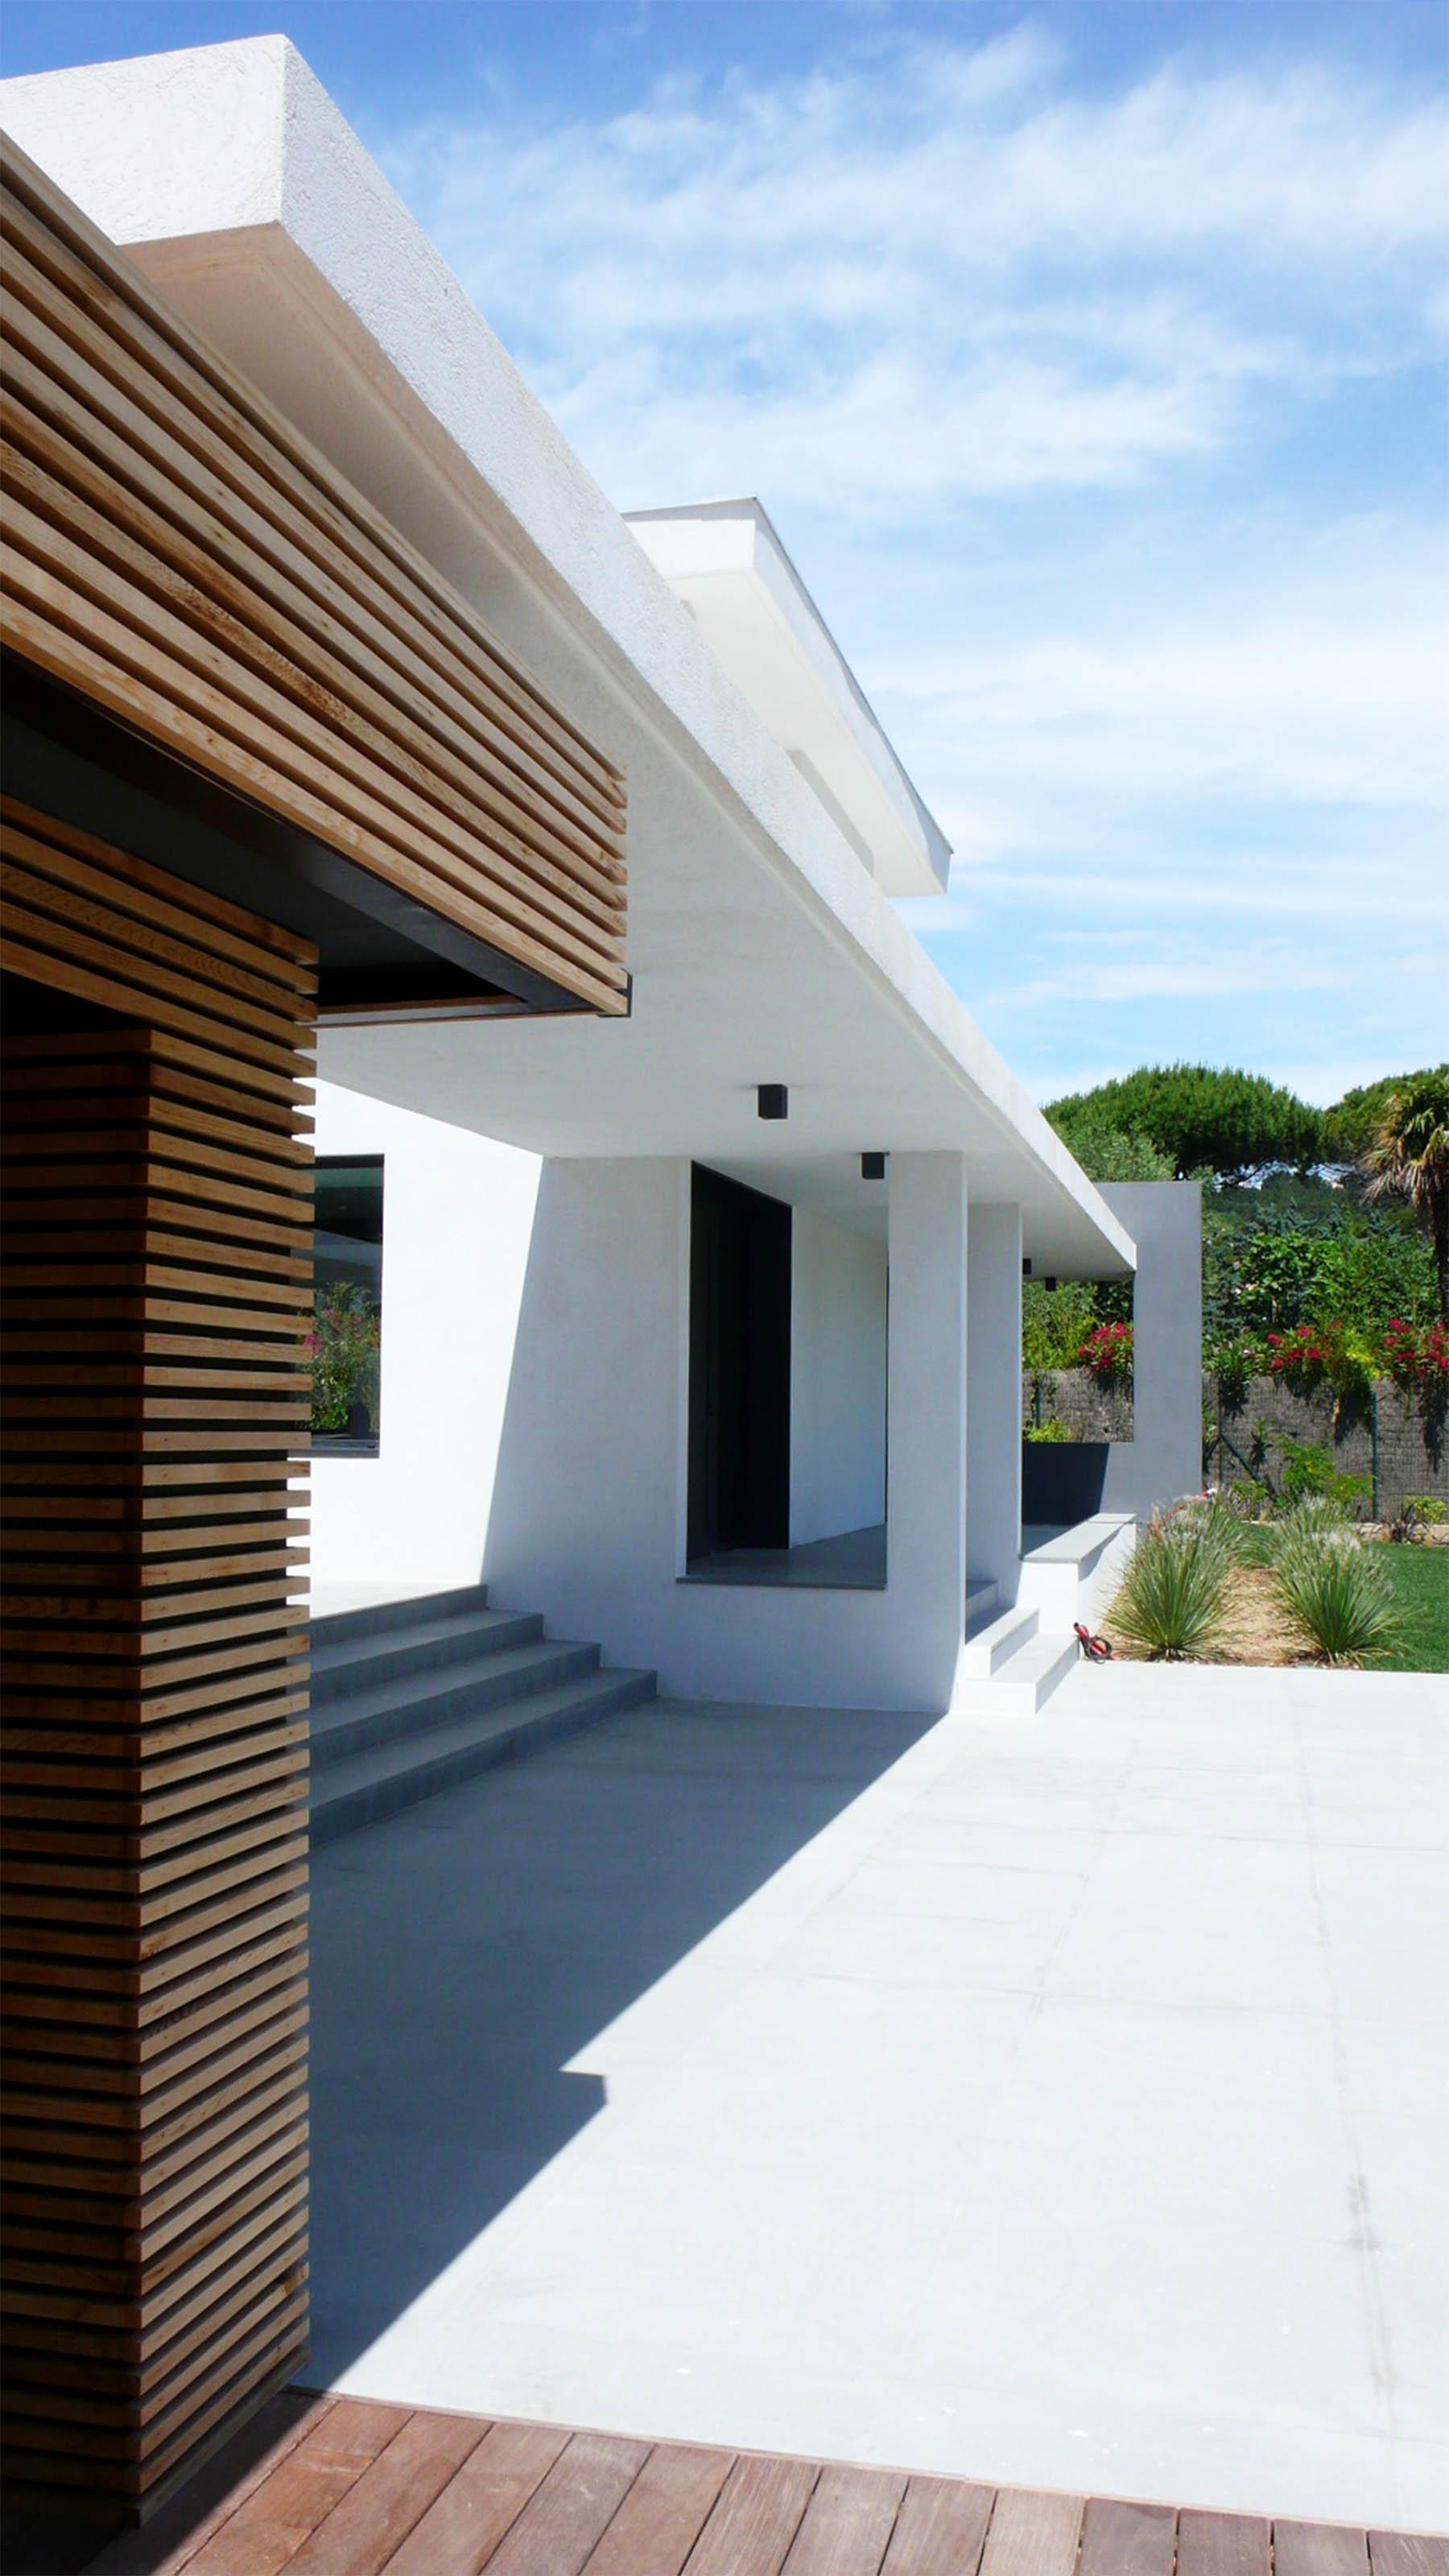 Villa-AJ-02.jpg